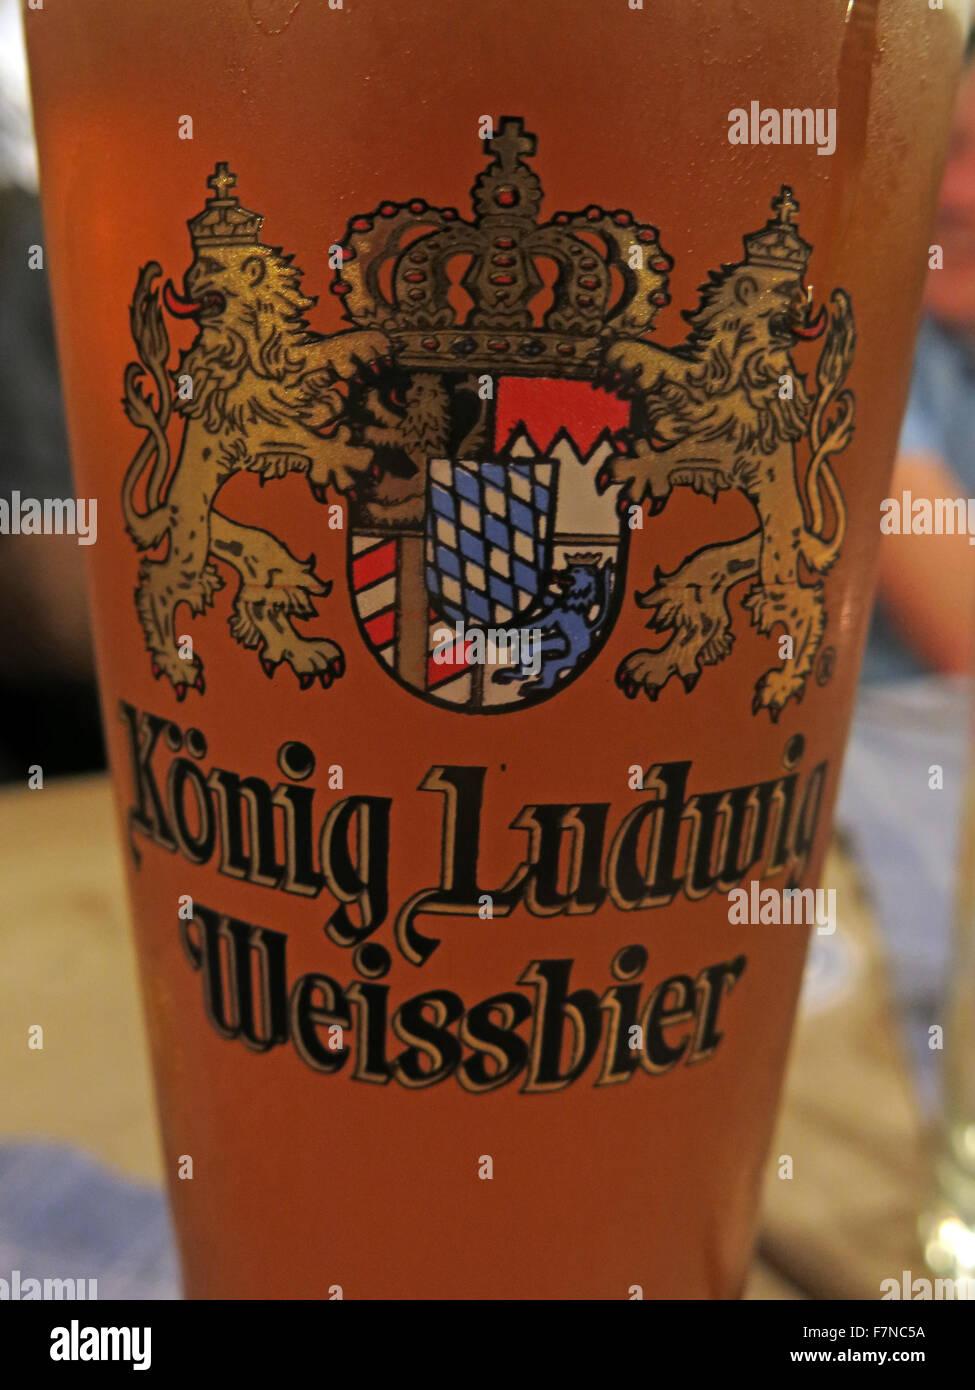 A glass of konig Ludwig Weissbier, Munich,Germany Stock Photo